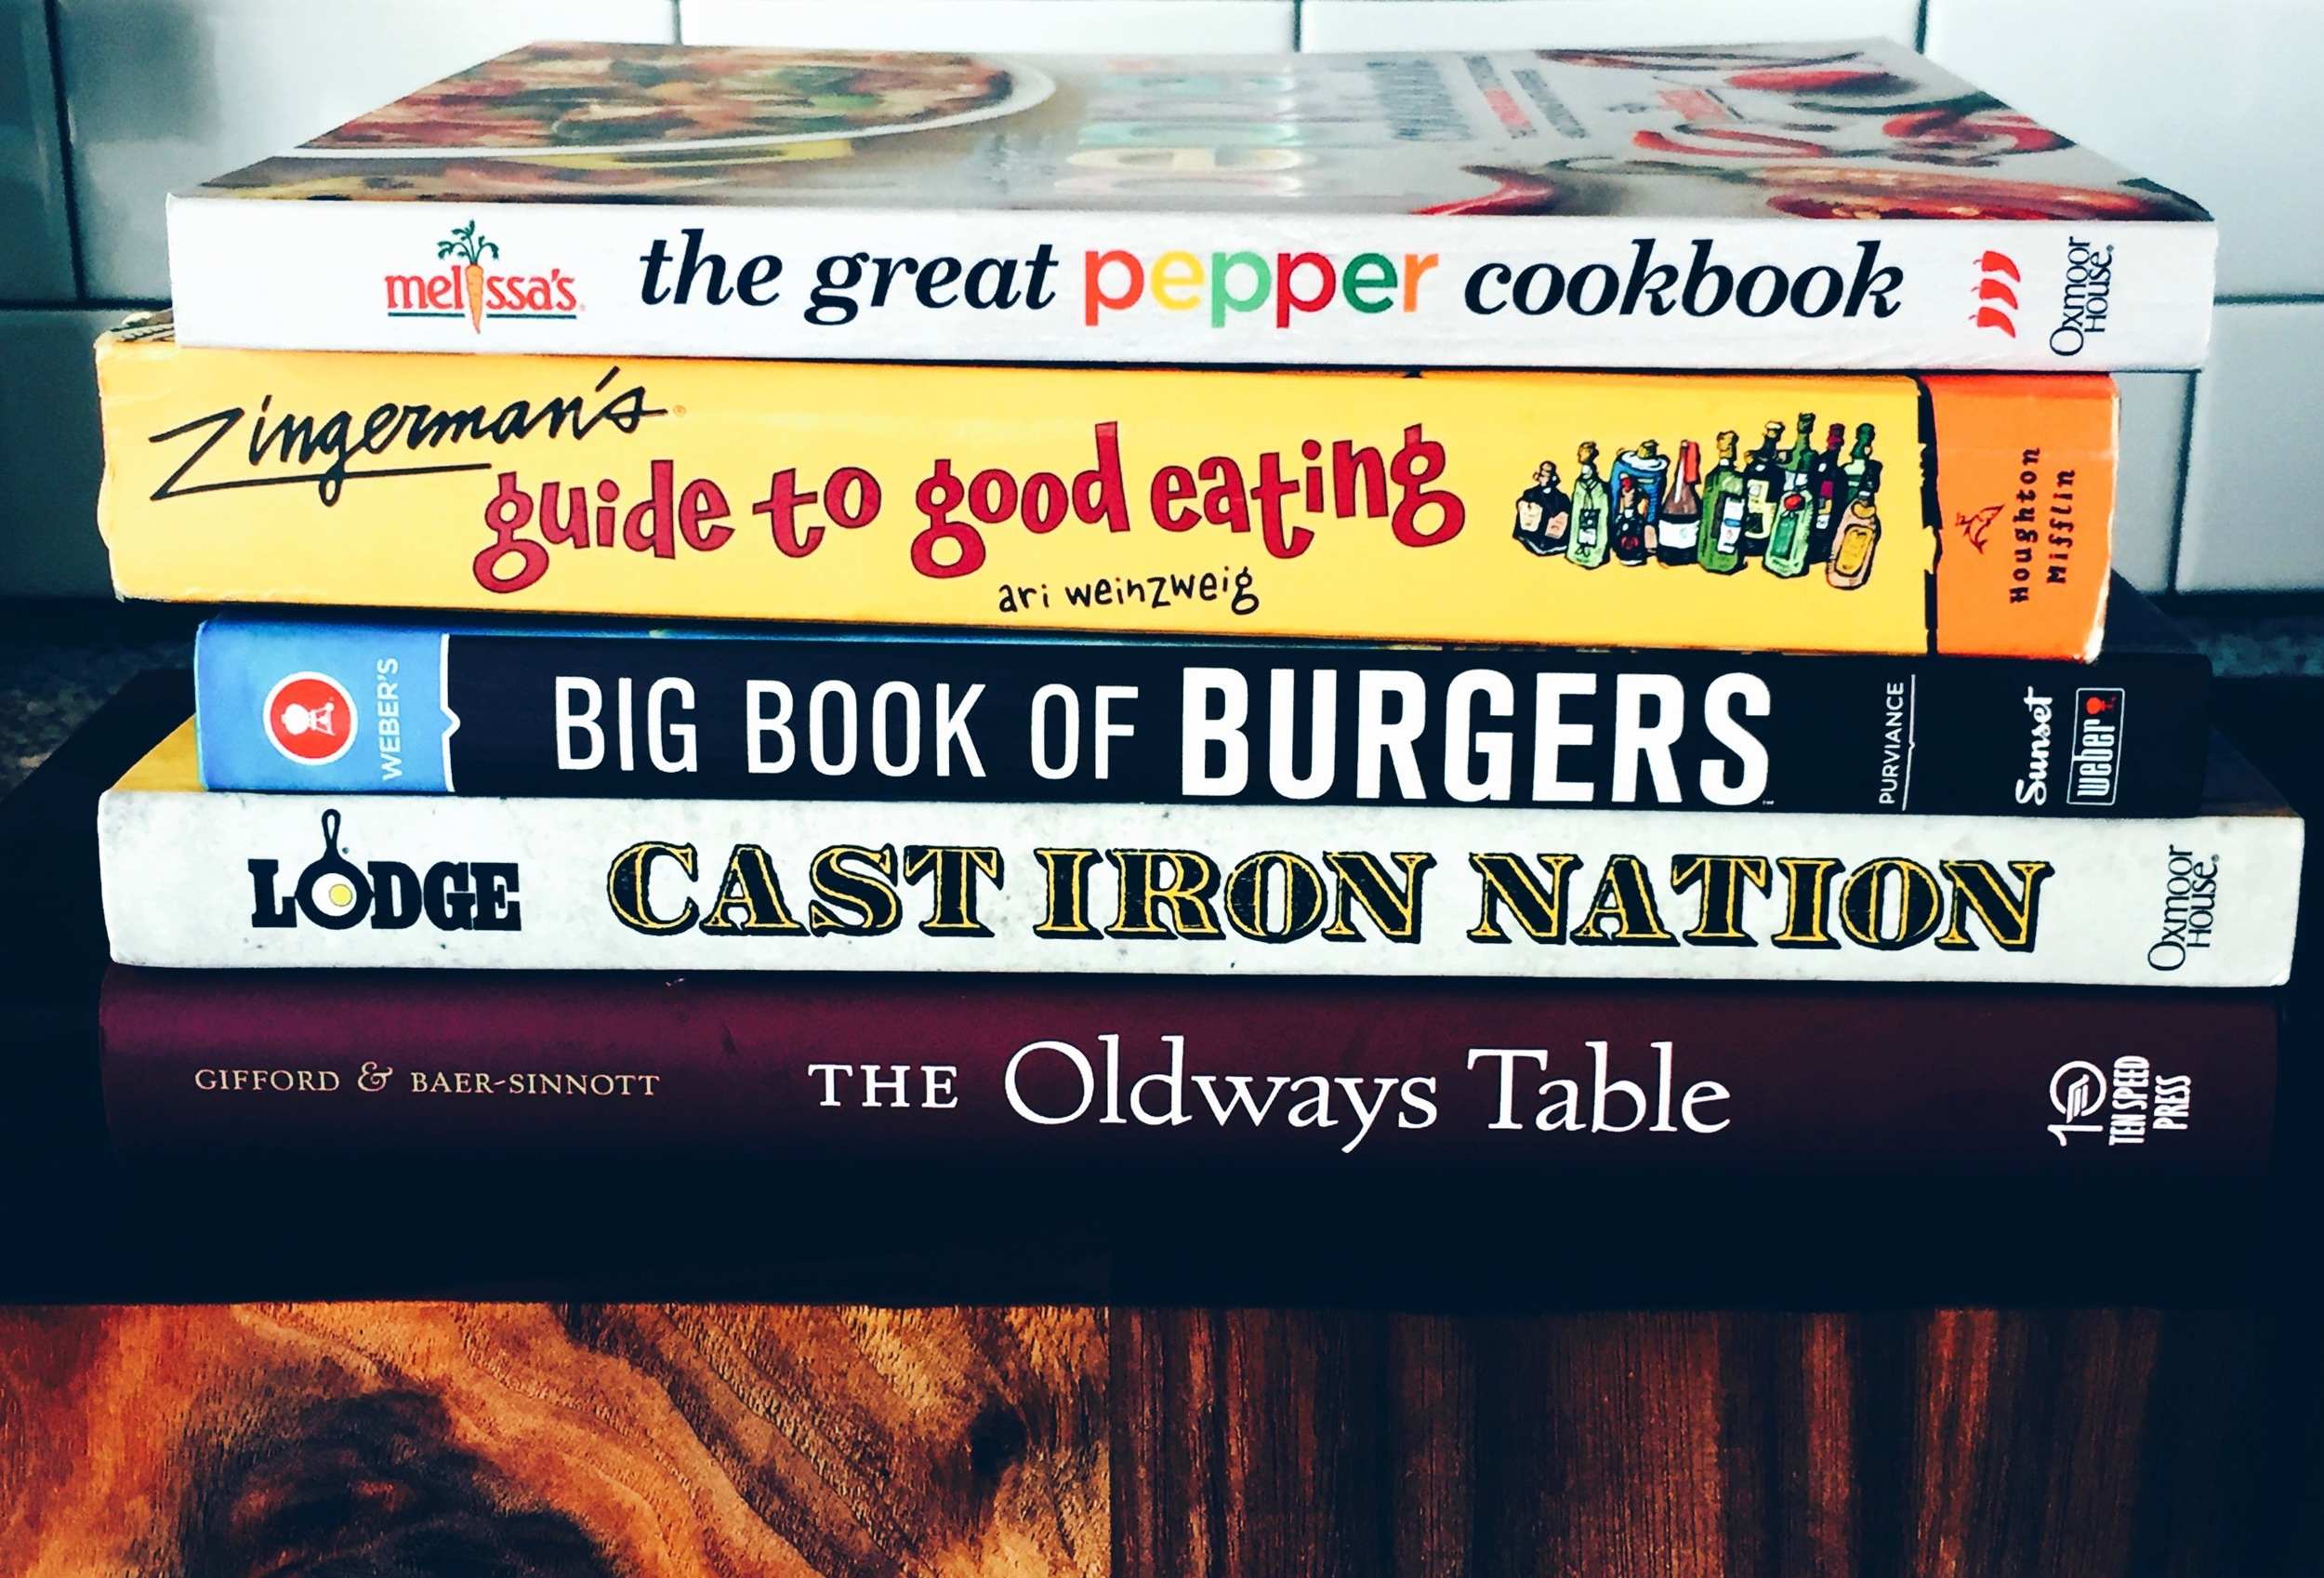 A few must reads cookbooks.